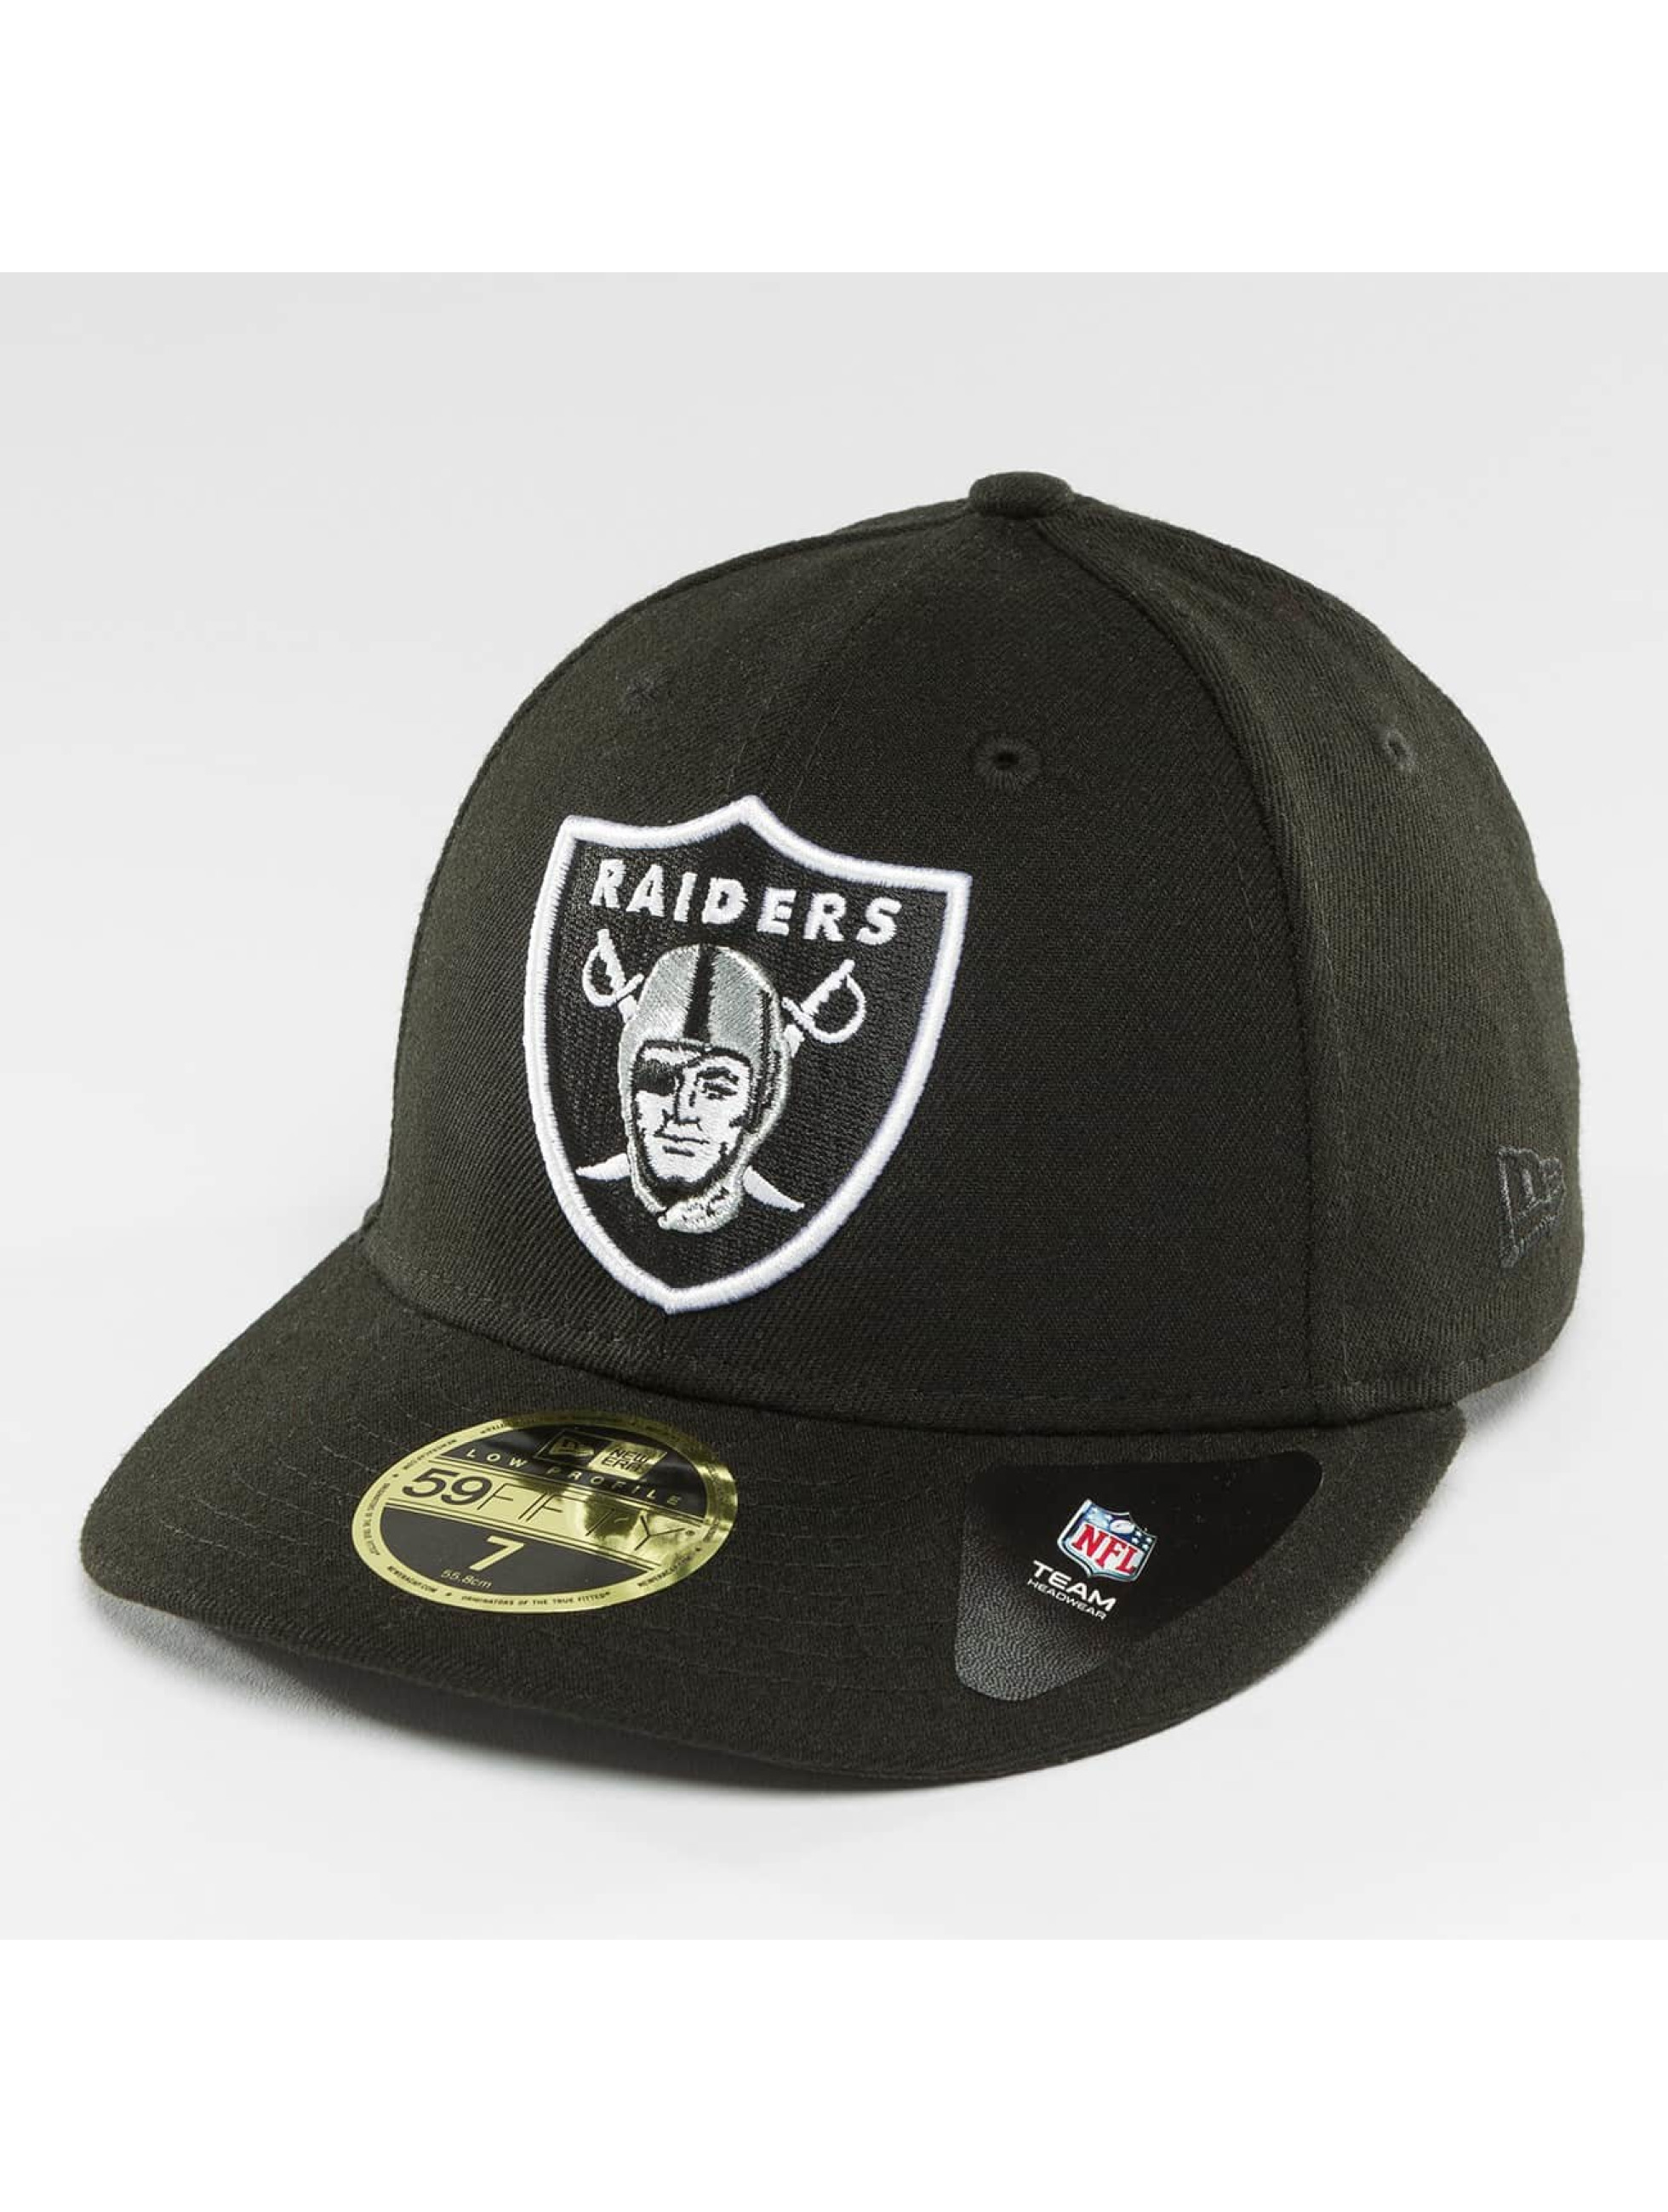 New Era Männer,Frauen Fitted Cap Team Classic Oakland Raiders 5*9Fitfy in schwarz